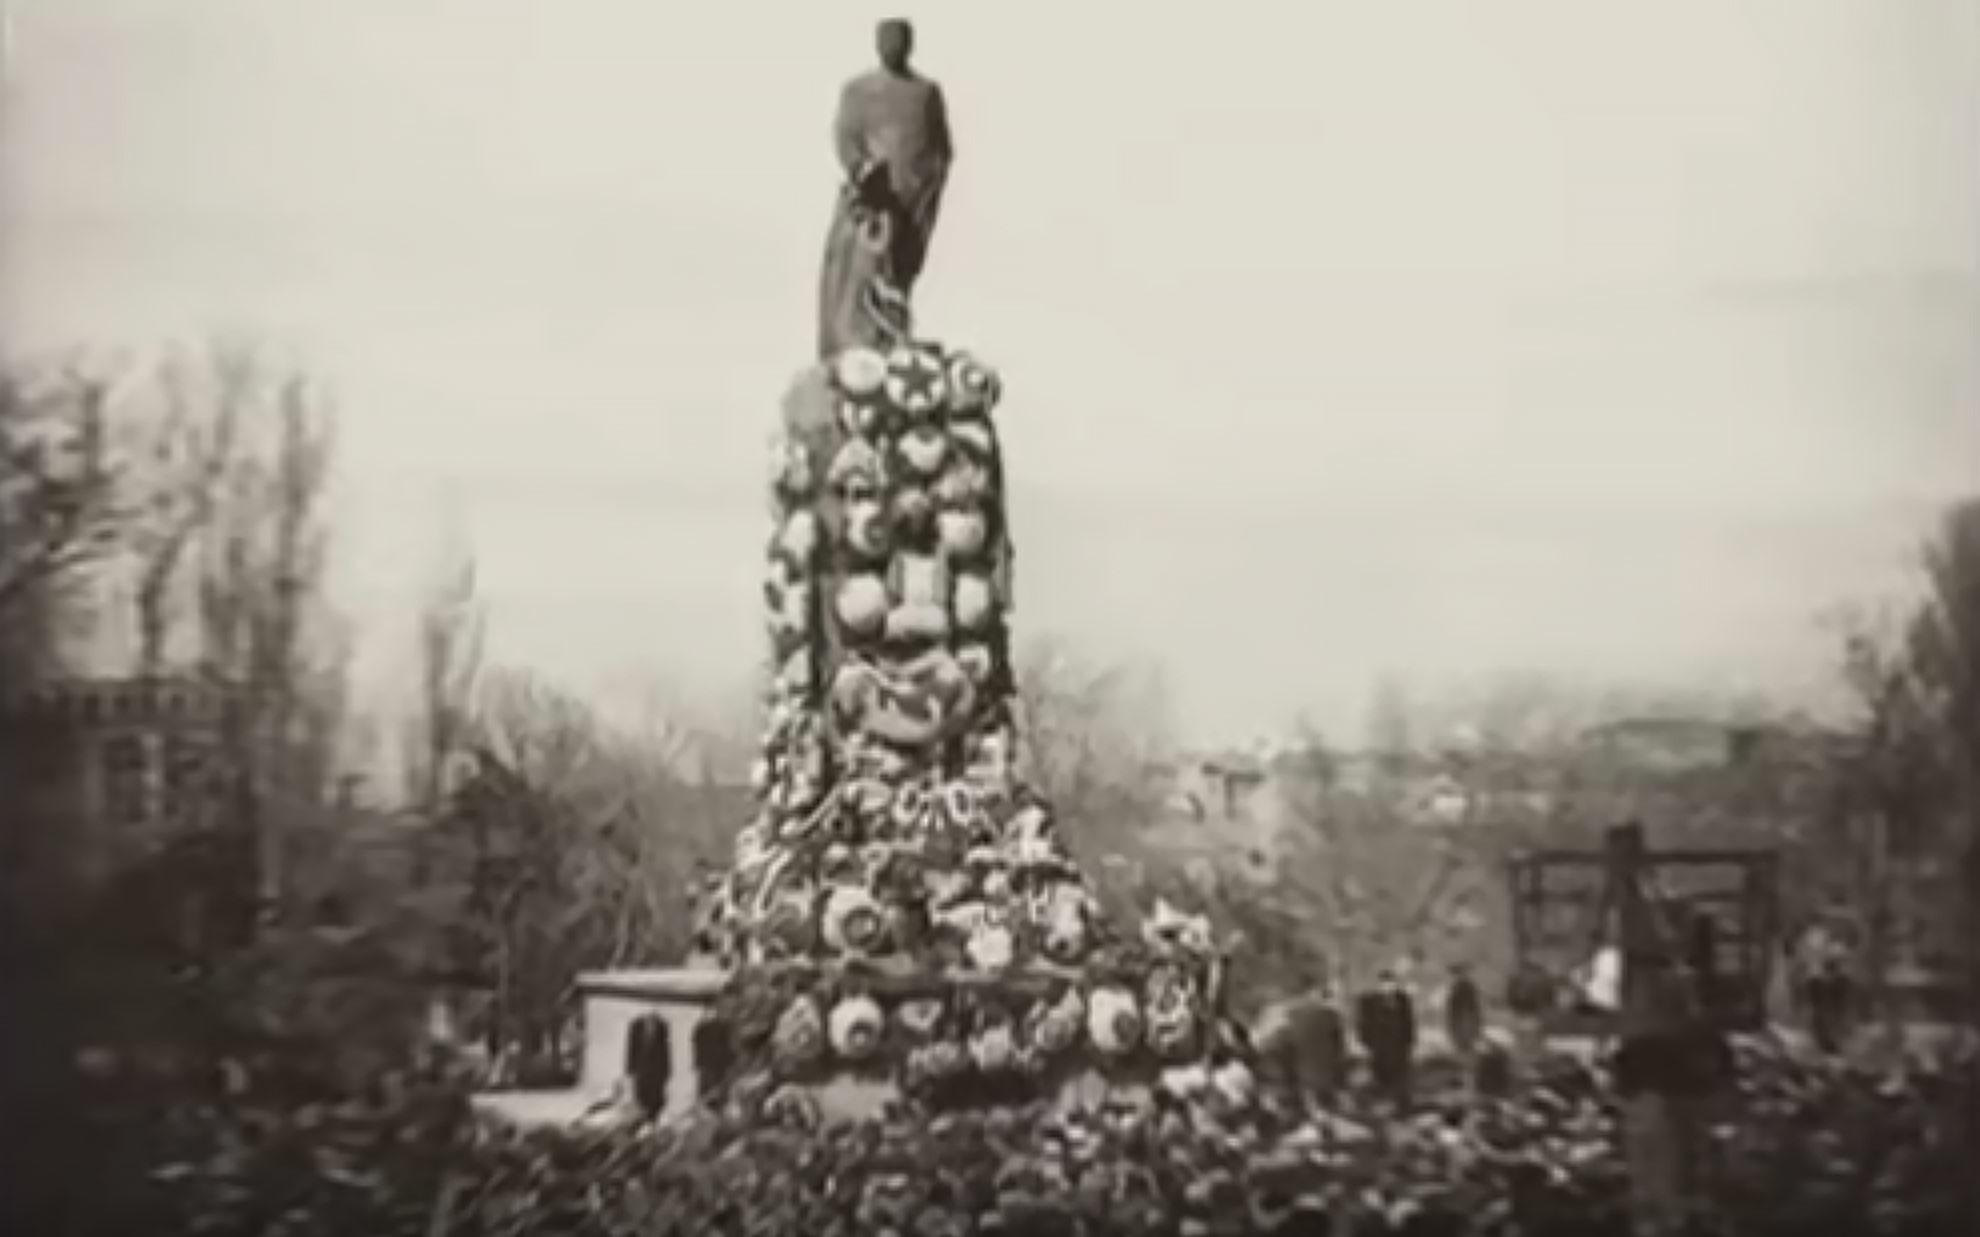 Памятник Сталину в Тбилиси, 1956 год. Фото © Кадр из видео YouTube / канал AtamanA